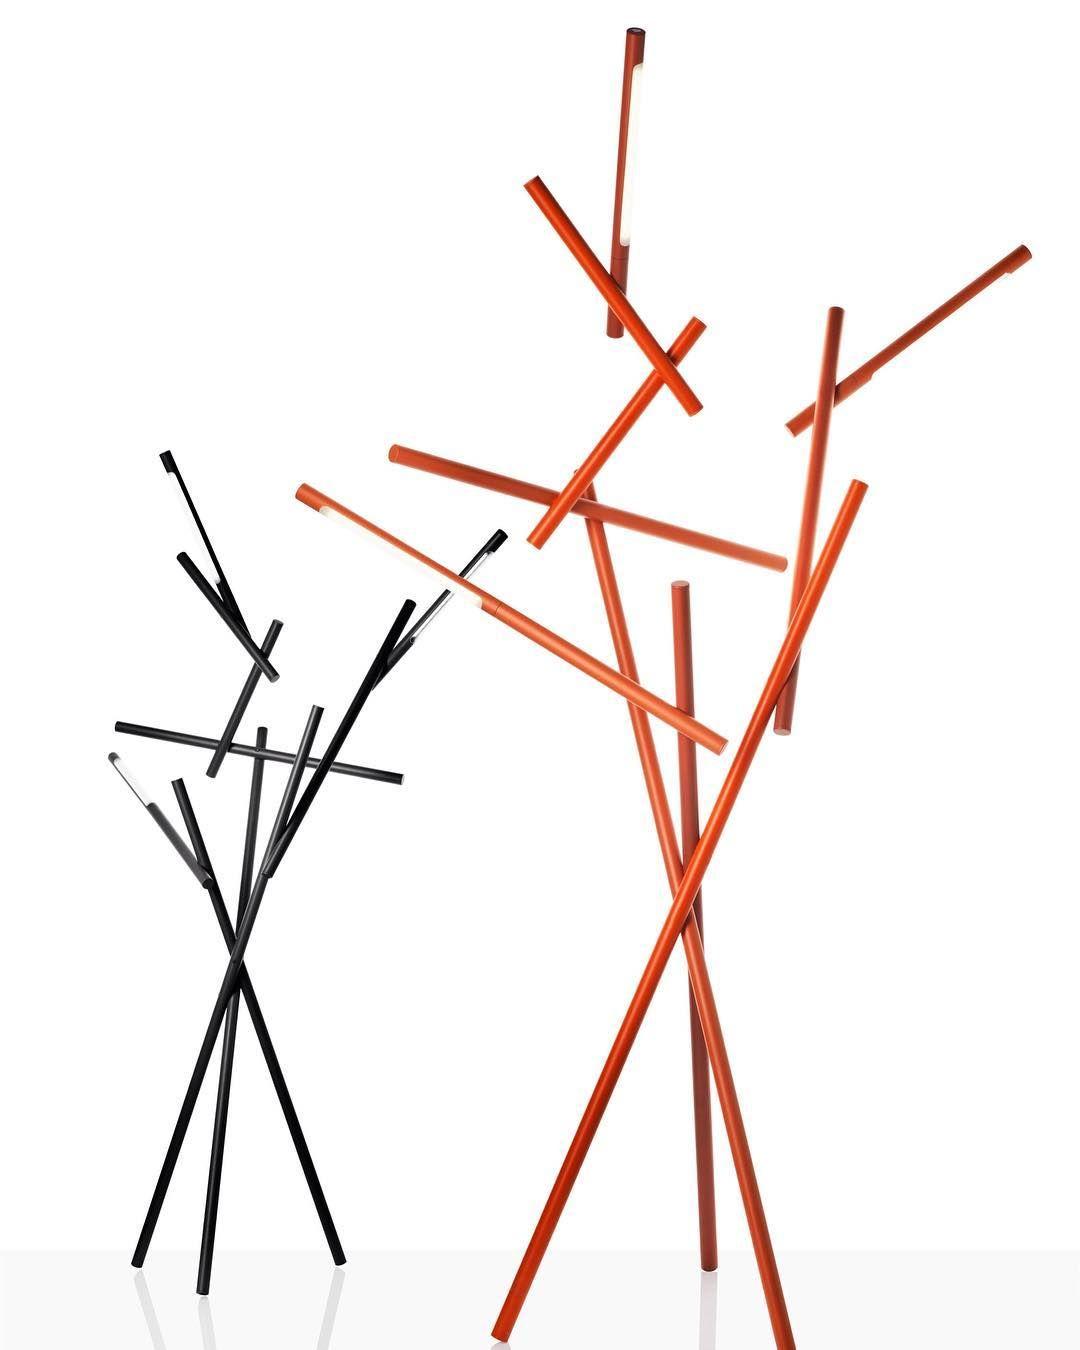 The Tuareg lamp by @ferrucciolaviani for @foscarinilamps creates a  brilliant branch-like array adding a playful & sculptural e…   Lamp design,  Floor lamp, Foscarini